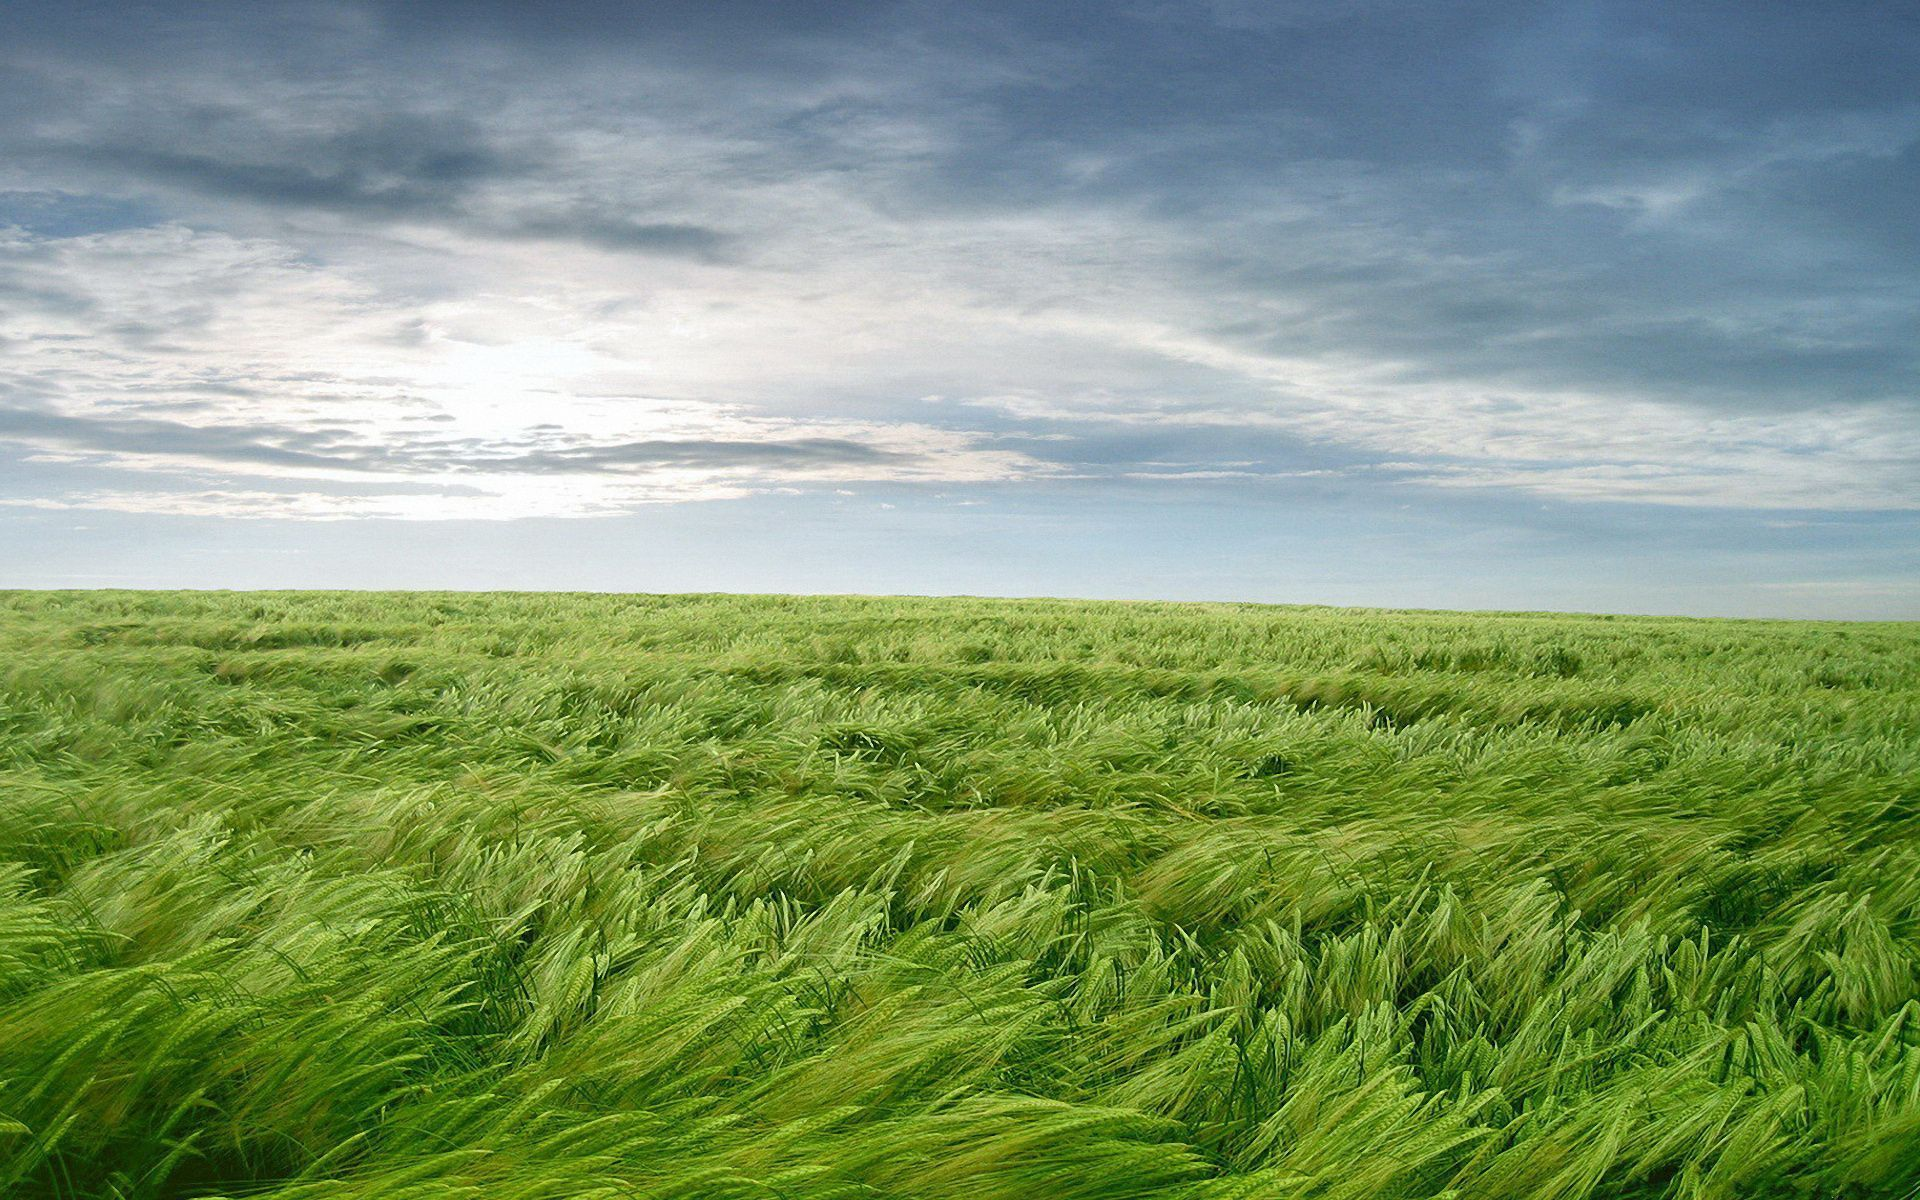 Wind Blowing Grass Wallpapersus Com Landscape Wallpaper Beautiful Nature Landscape Wallpaper grass field rainbow hill fog